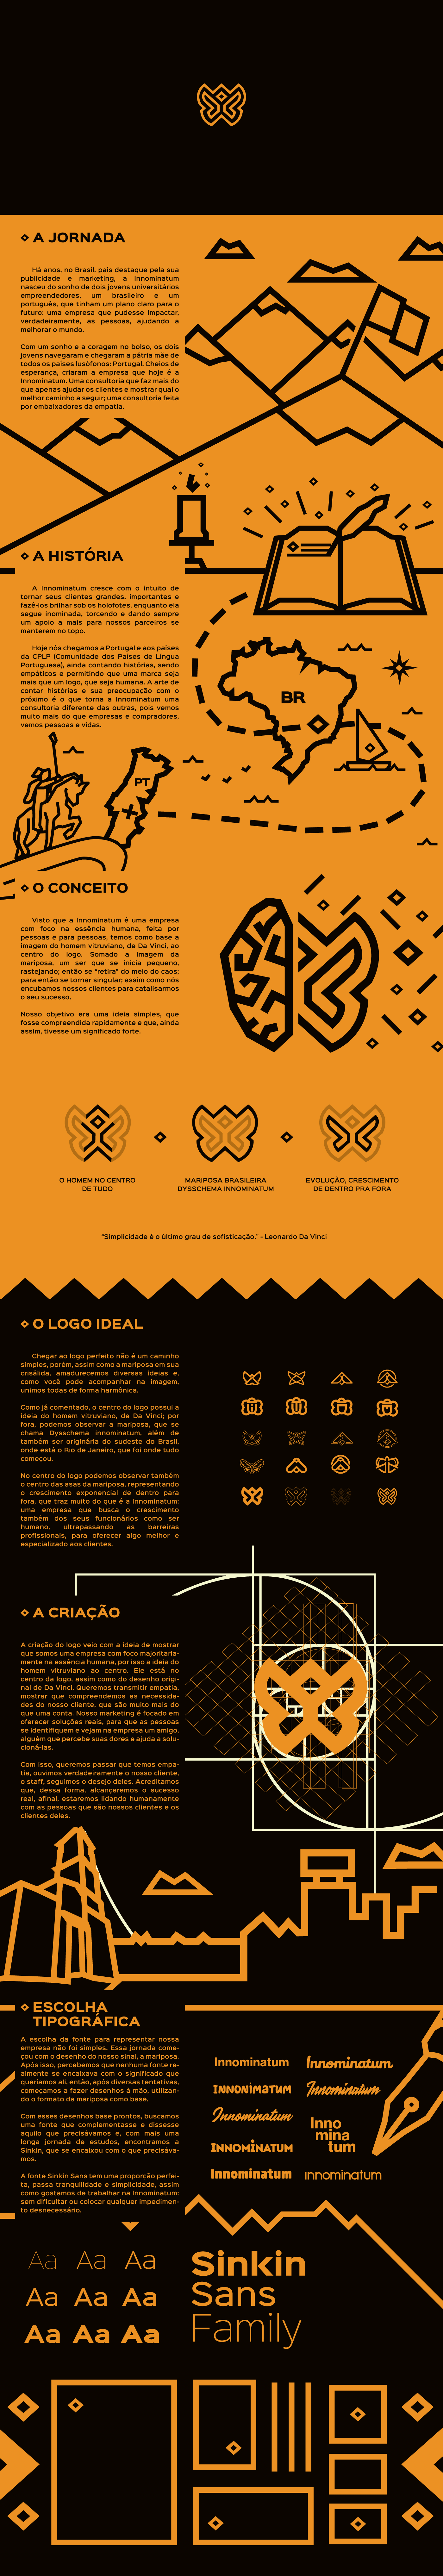 brand Consulting innominatum yellow black ILLUSTRATION  agency design